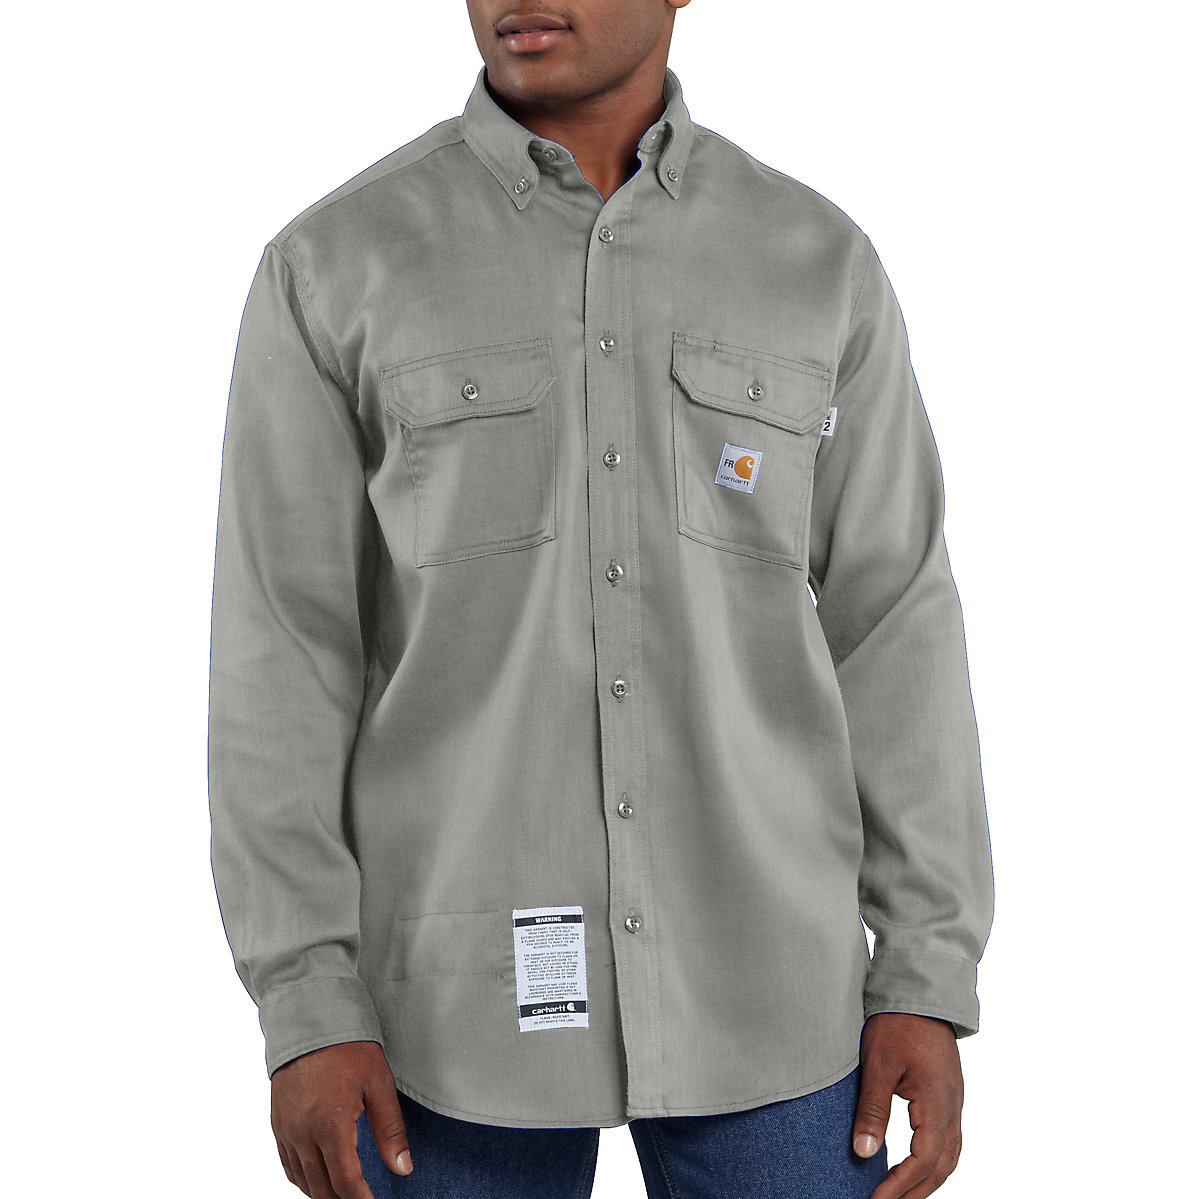 Men 39 s flame resistant lightweight twill shirt frs003 for Carhartt work shirts tall